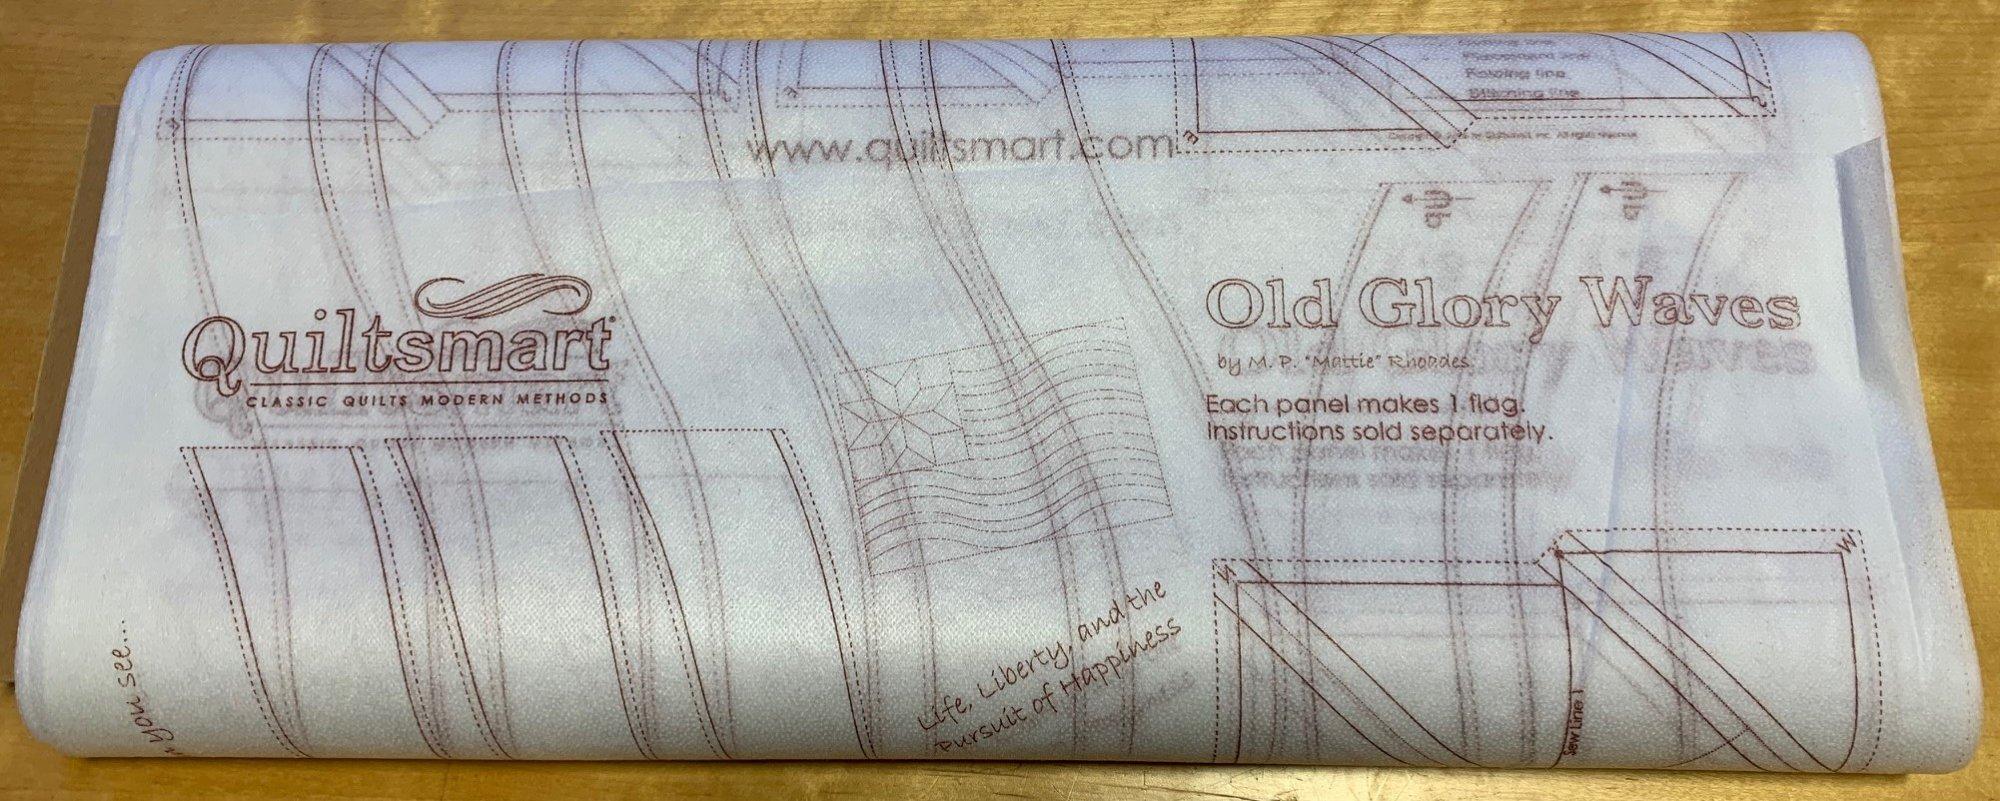 Old Glory Waves Interfacing 25-panel Bolt